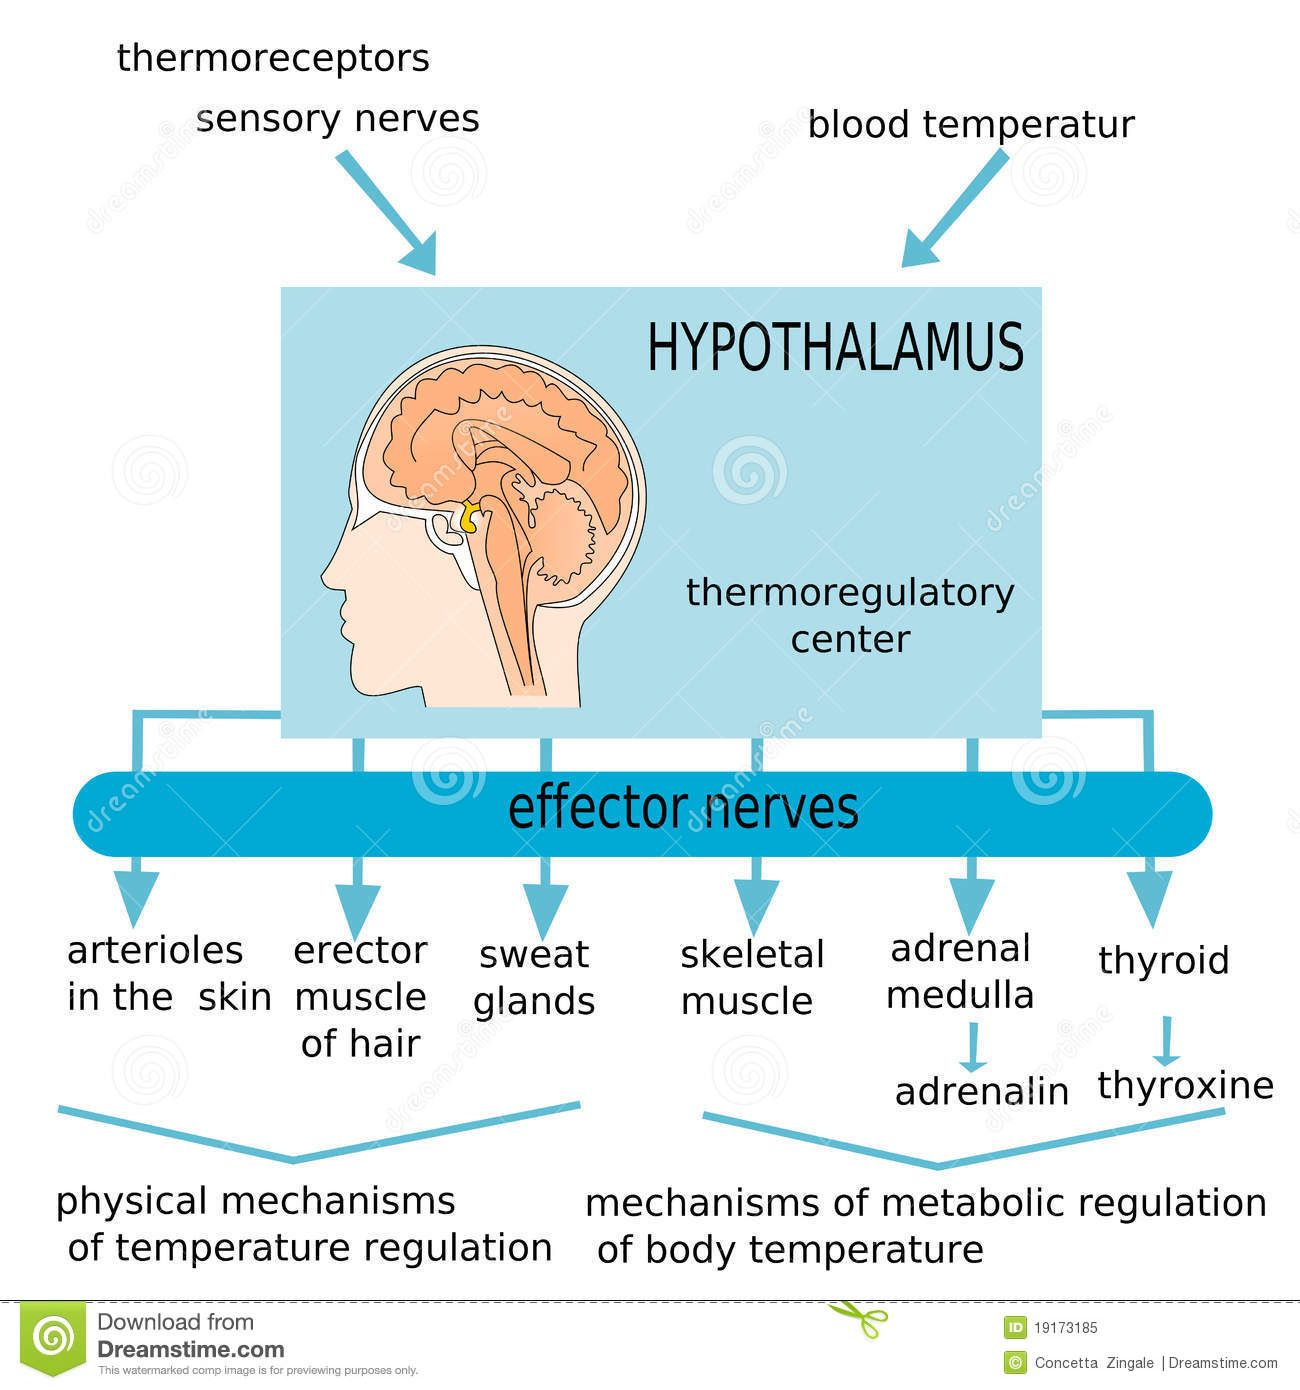 hypothalamus temperature regulation physical vs metabolic regulation of body temperature are. Black Bedroom Furniture Sets. Home Design Ideas